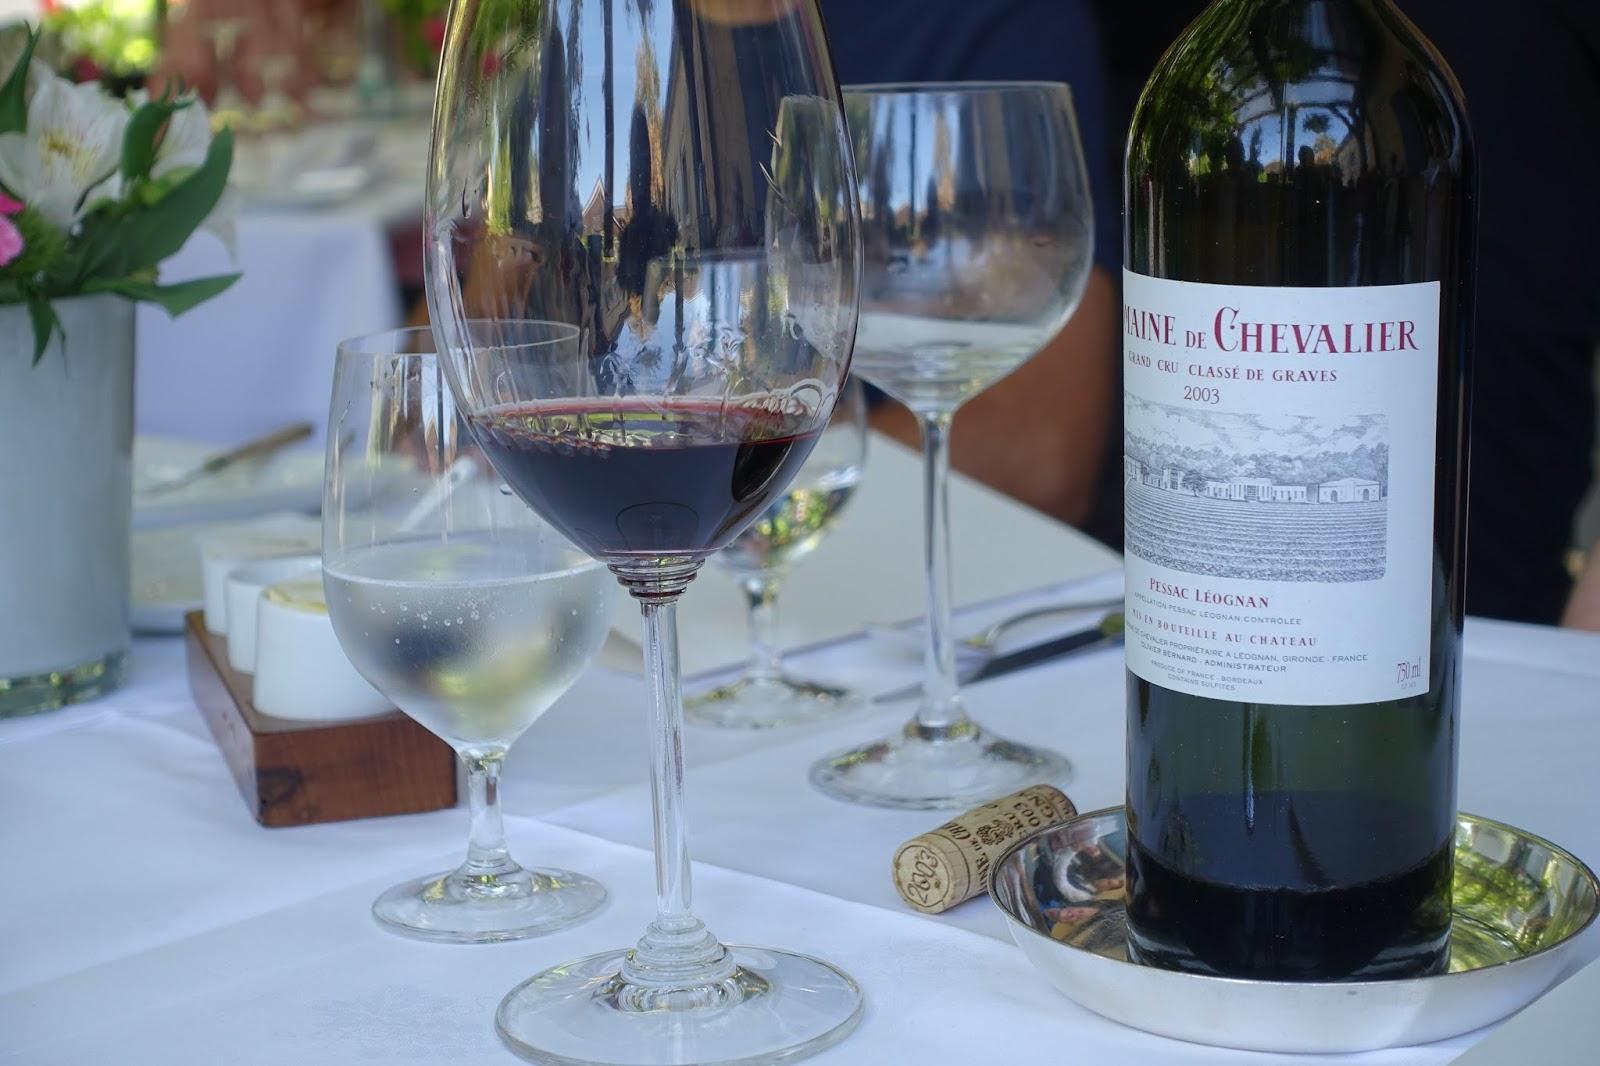 schiller-wine: Dinner at Restaurant Schwarzer Adler, 1 Star Michelin ...